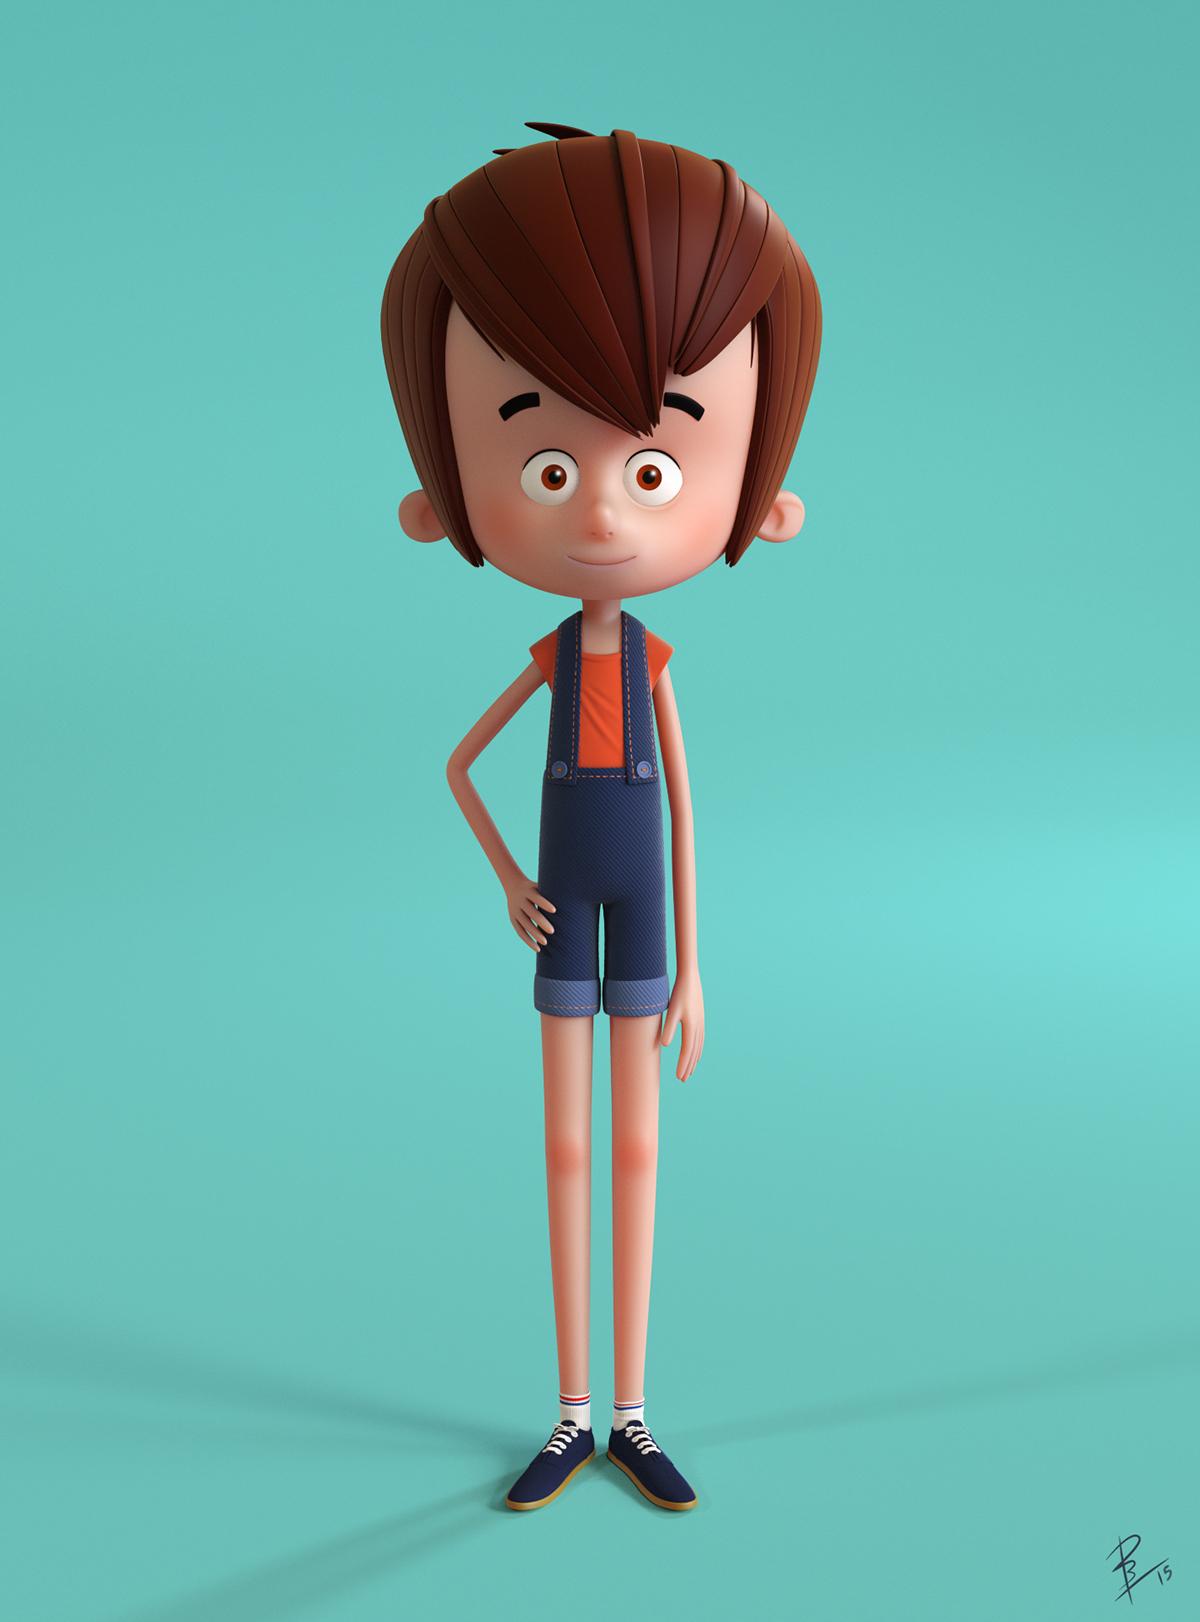 Character Design C4d Tutorial : D modeling on behance